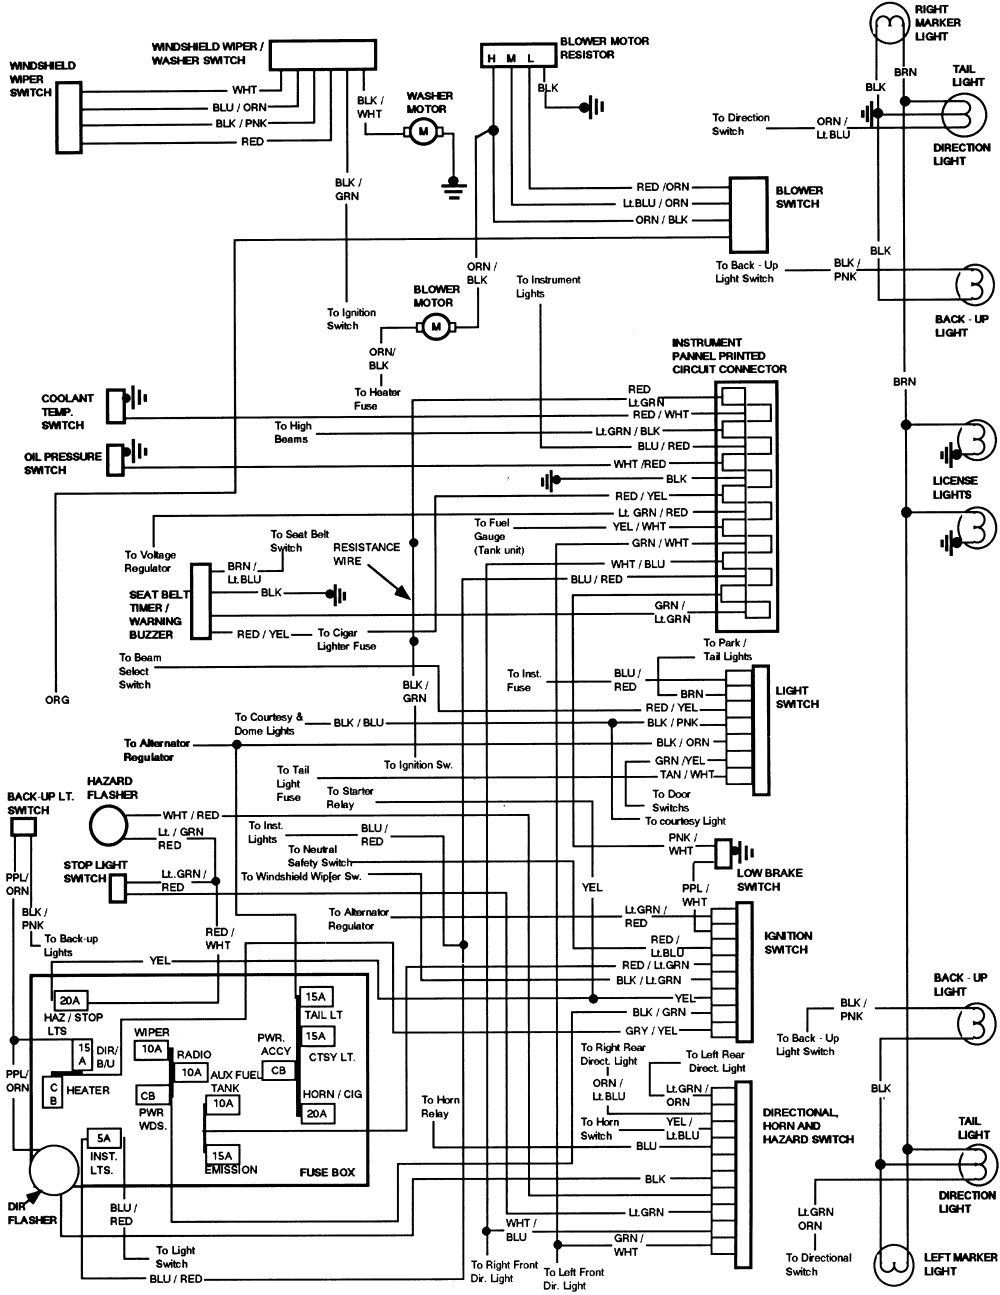 ford wiring diagrams schematics wiring diagram blog ford diagrams schematics